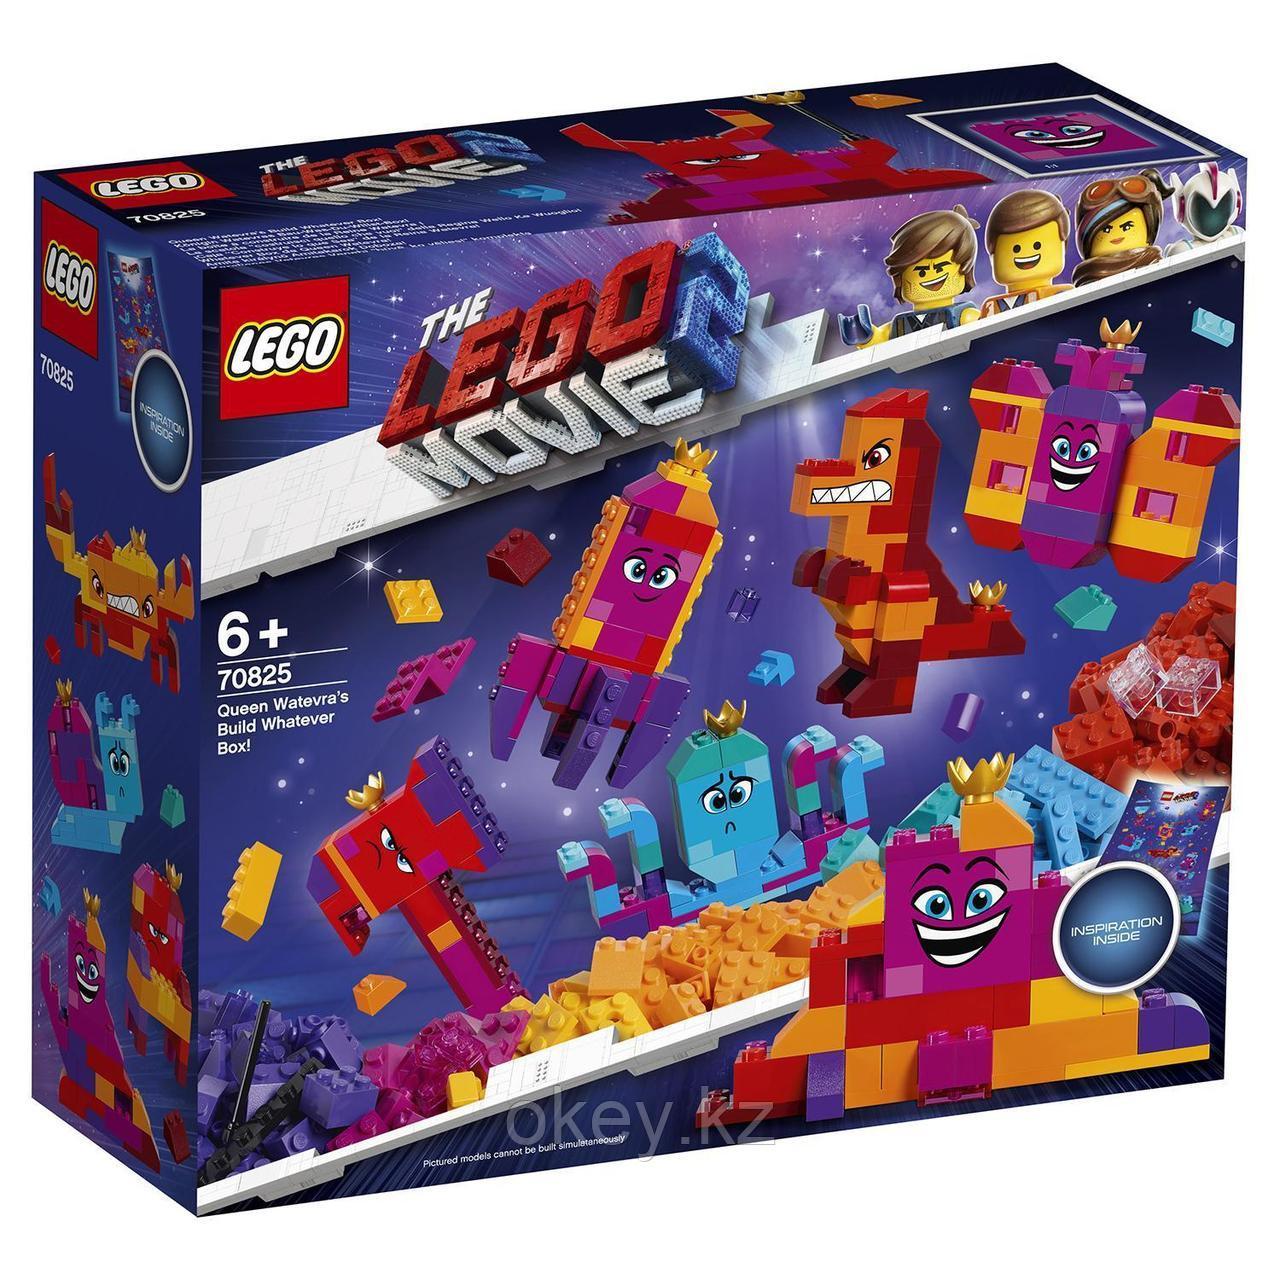 LEGO Movie: Шкатулка королевы Многолики Собери что хочешь 70825